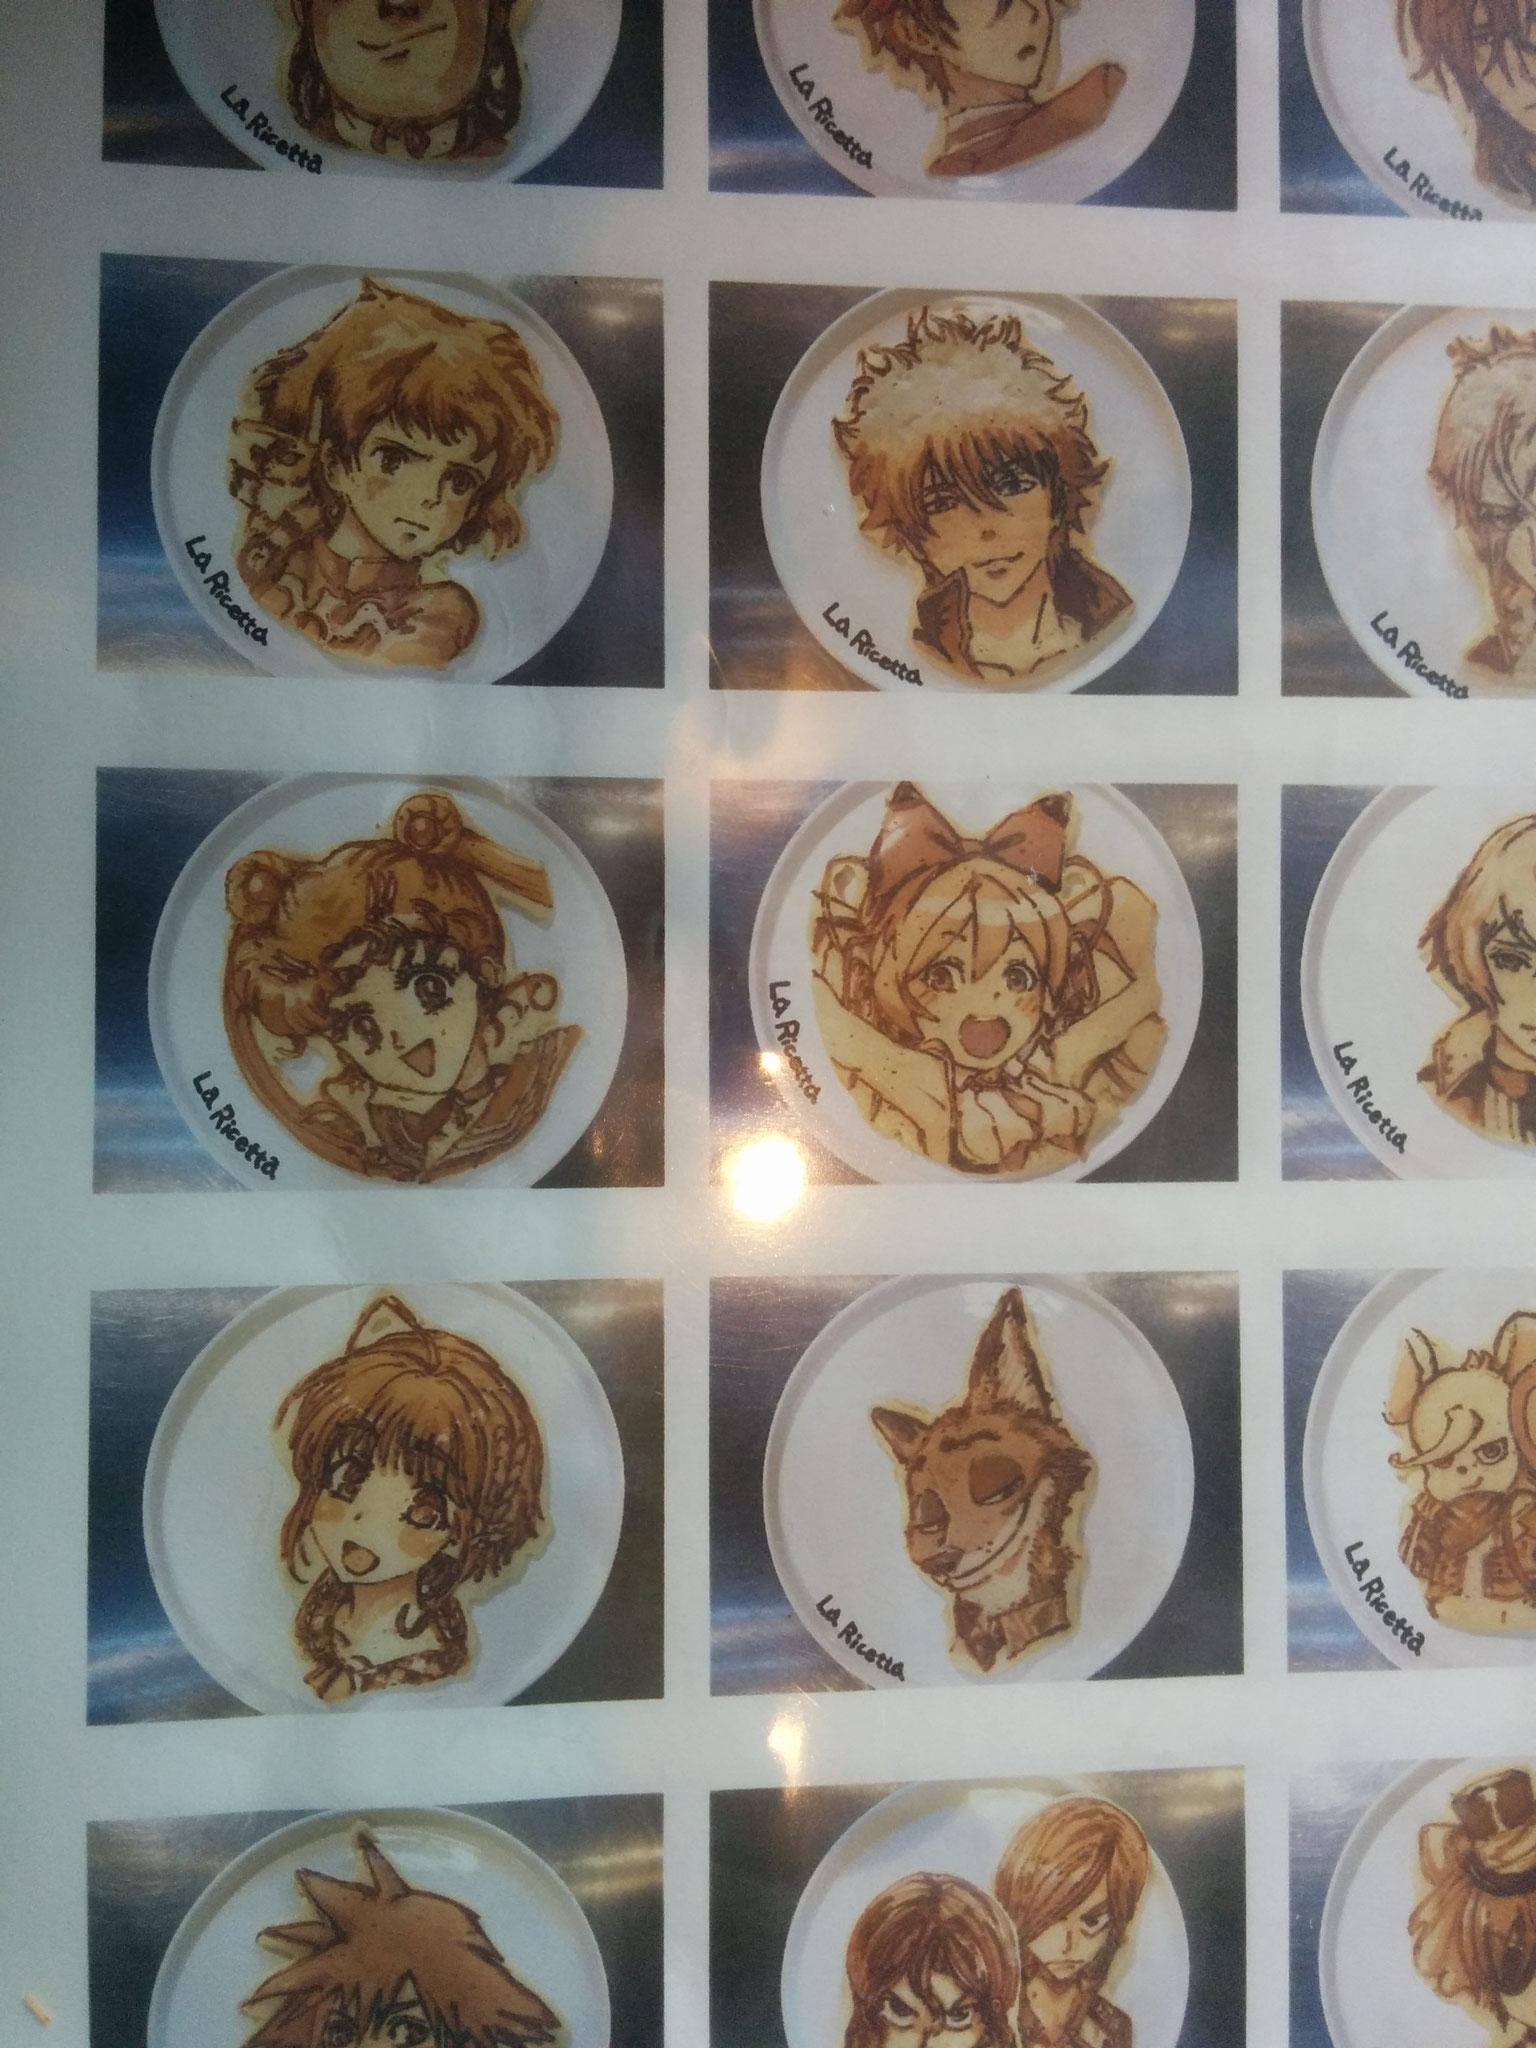 1 Pancakes the chef of the Italian restaurant designed!